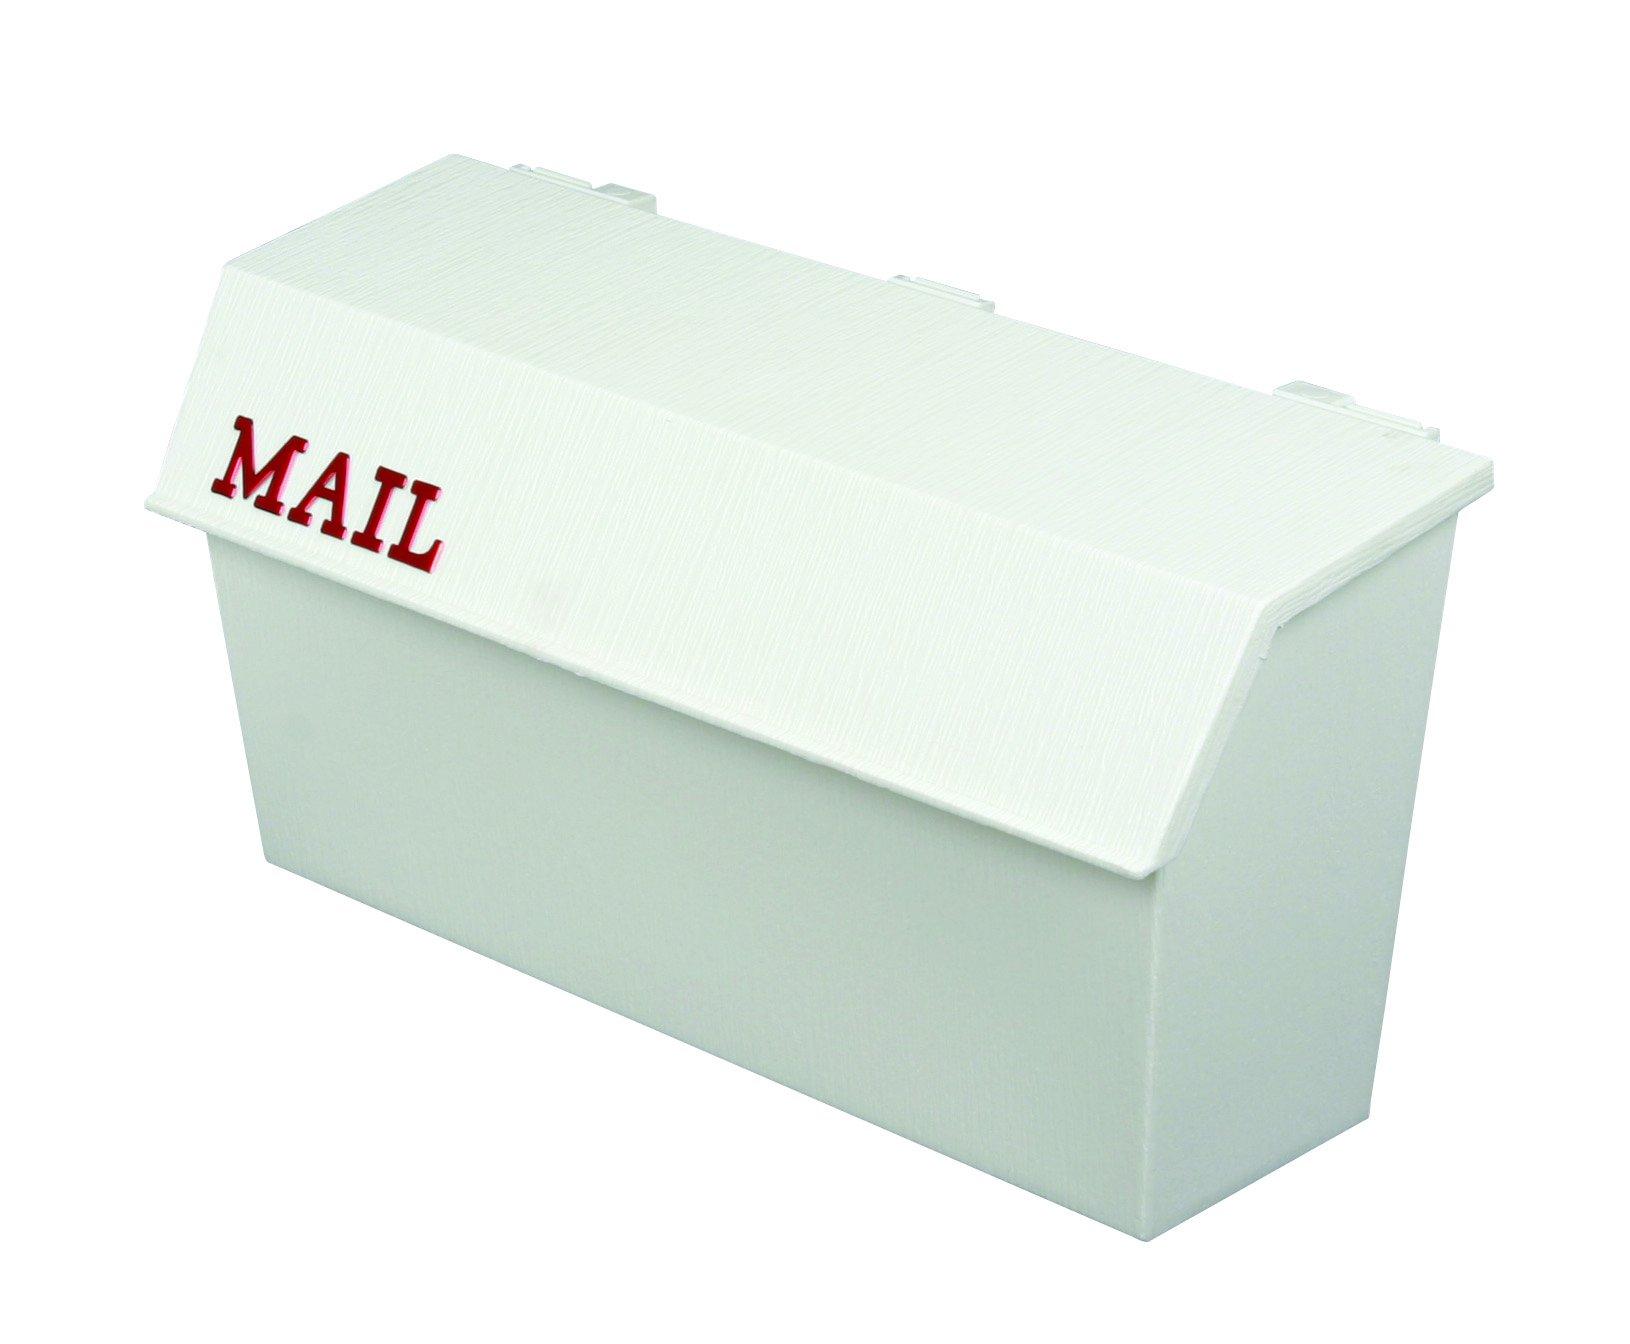 Flambeau T-H6003WT Classic Wall Mount Mailbox, Wood Grain Texture, White